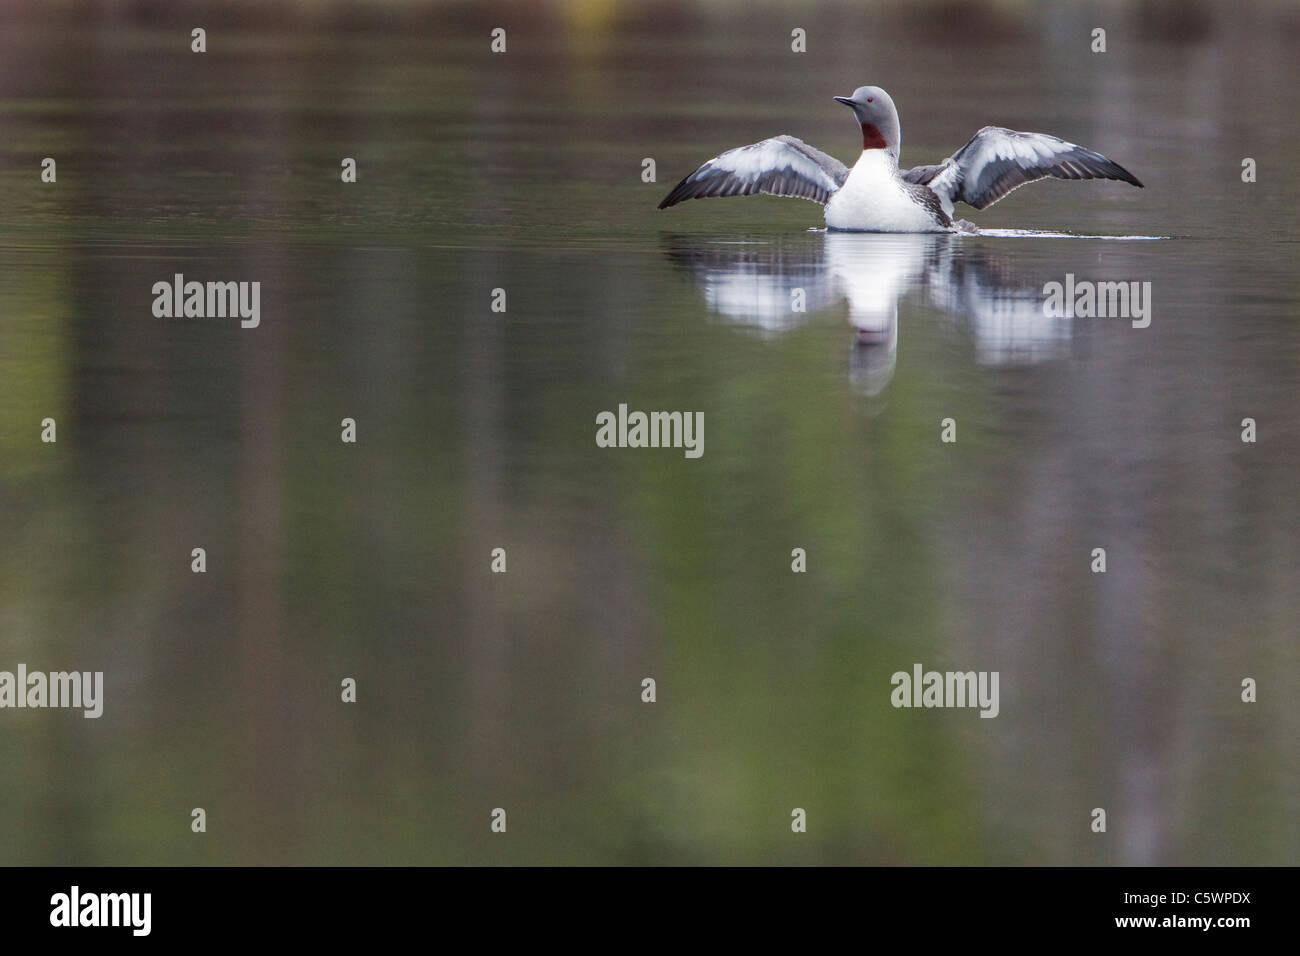 Jiujitsu (Gavia stellata), aile-stretching adultes sur le loch de reproduction au printemps. L'Ecosse, Grande Photo Stock